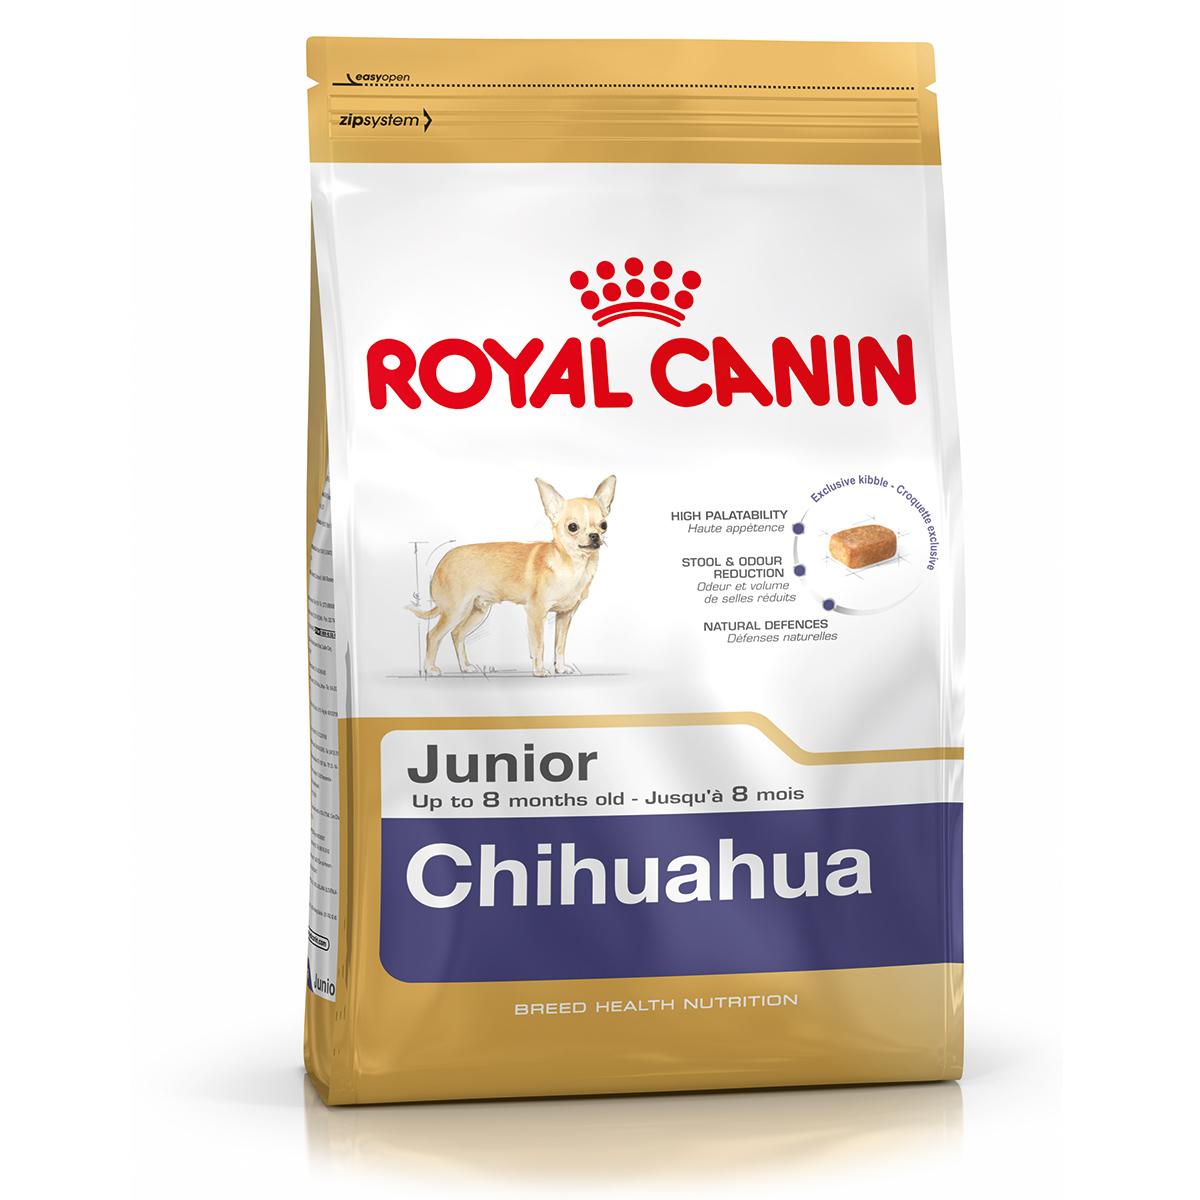 Royal Canin Chihuahua Junior imagine